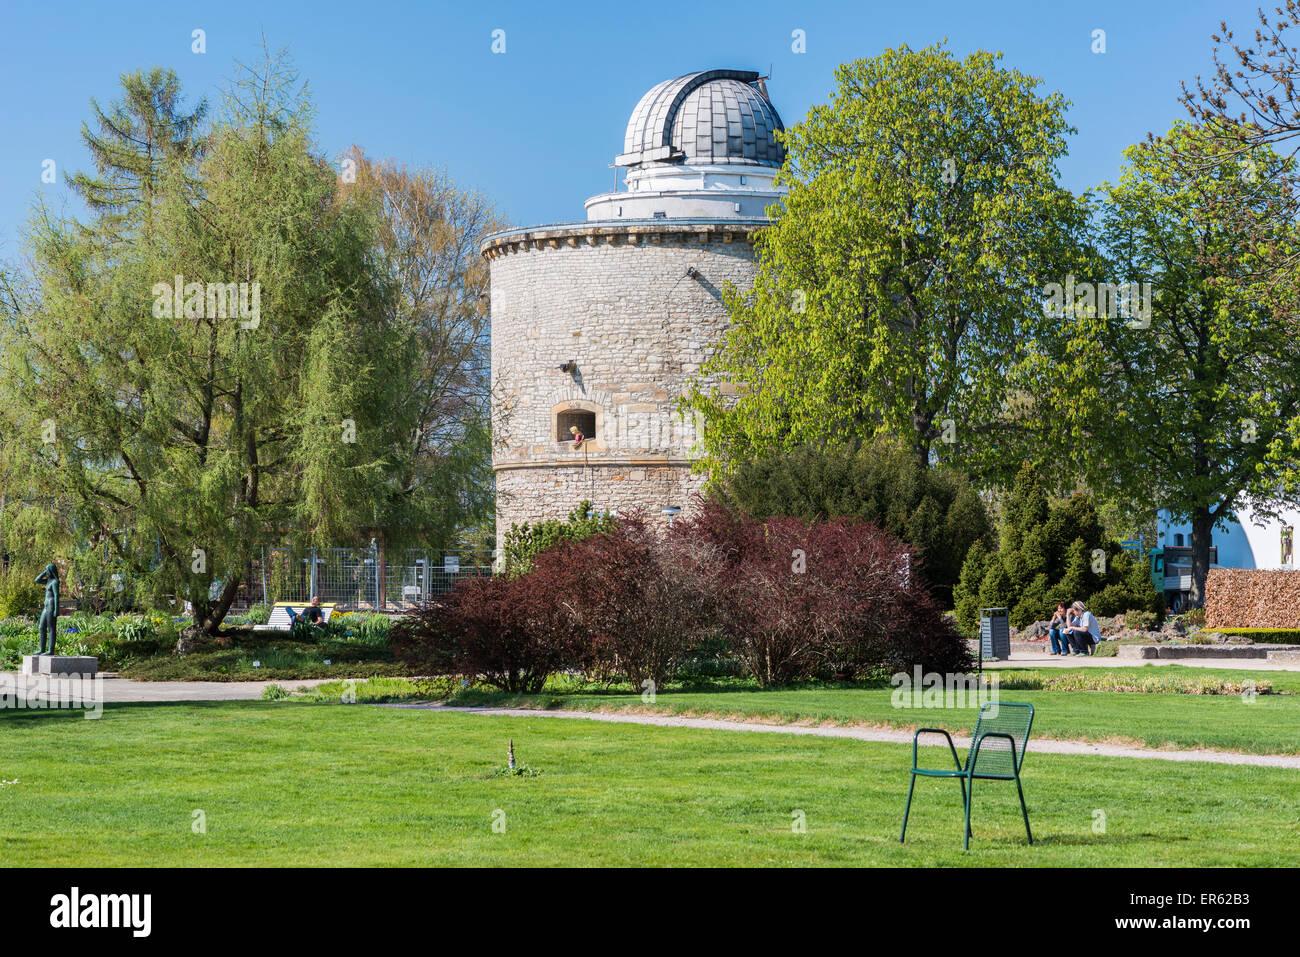 Osservatorio Erfurt nella vecchia torre nord di Cyriaksburg, egapark, BUGA 2021, Erfurt, Turingia, Germania Immagini Stock